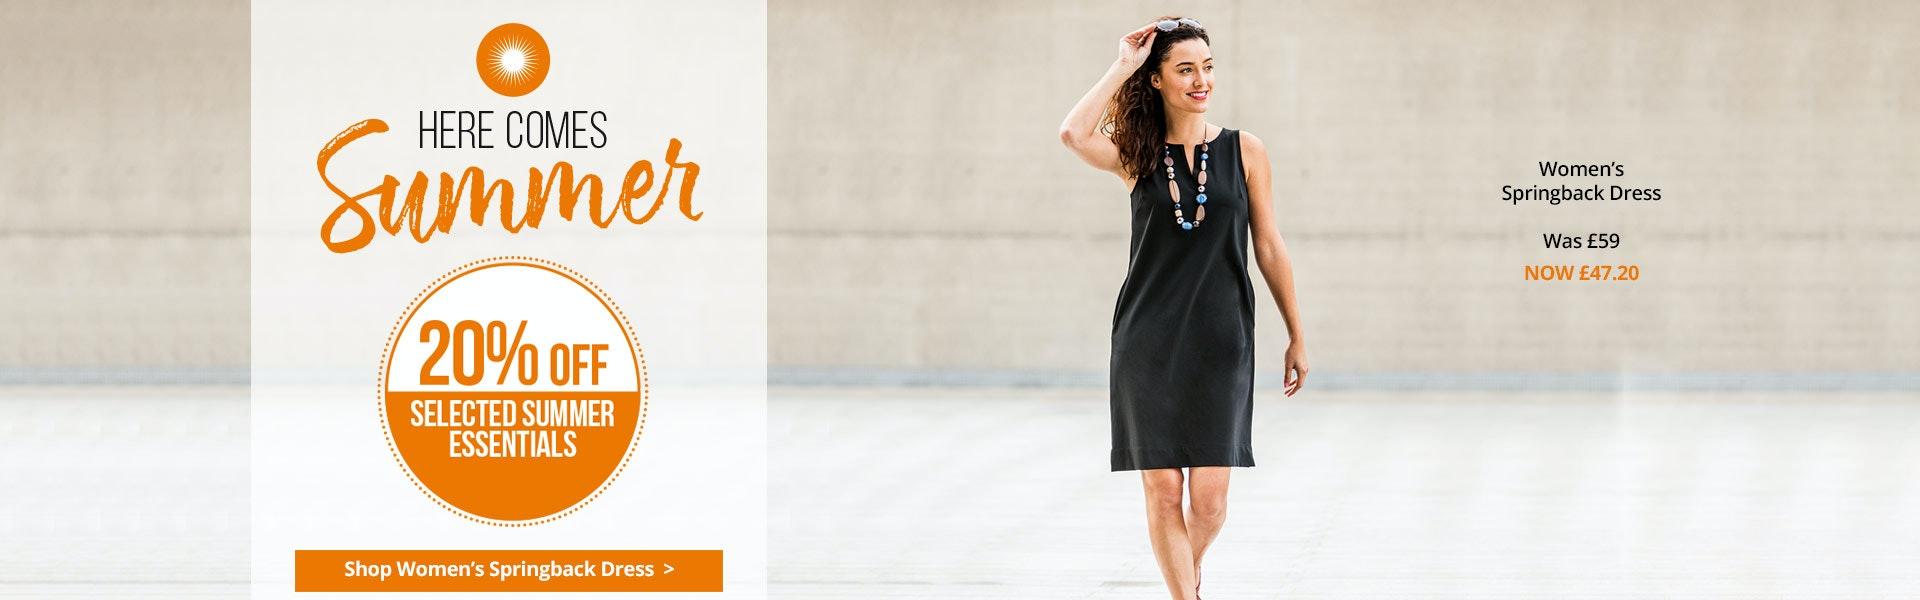 Shop Women's Springback Dress